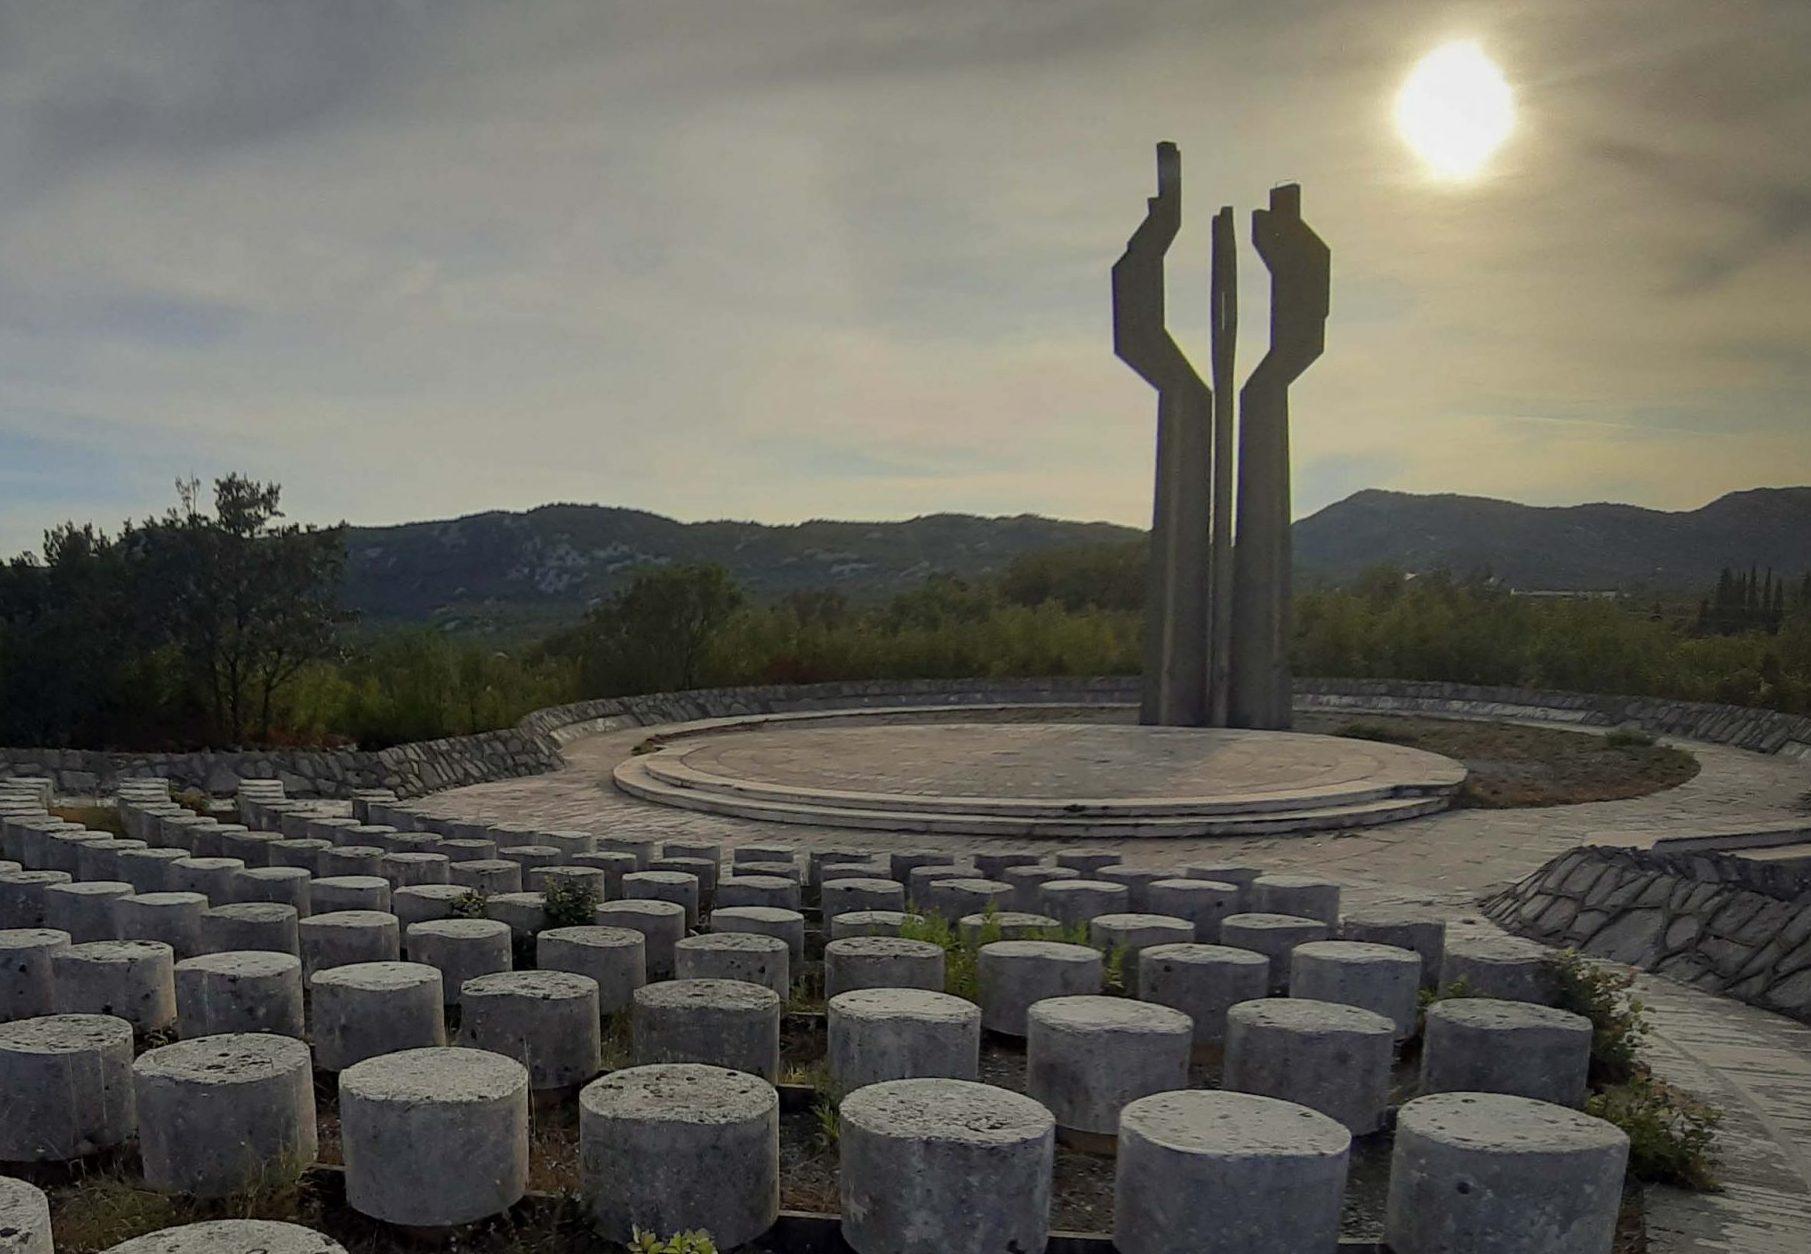 monument-to-soldiers-ljesanka-nahija-montenegro